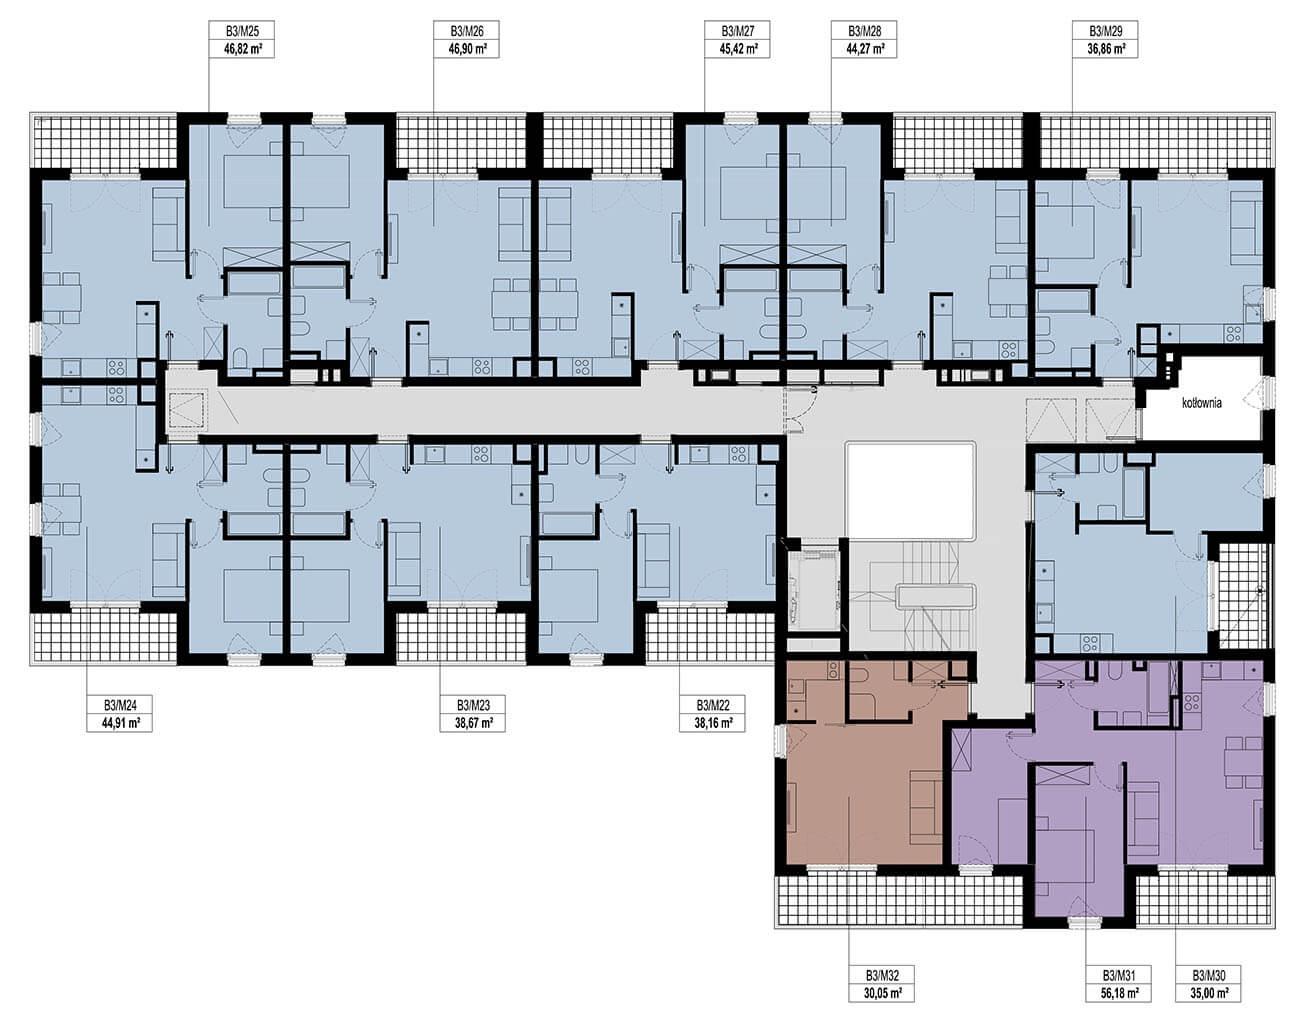 Etap 3 - Budynek B - Piętro 2